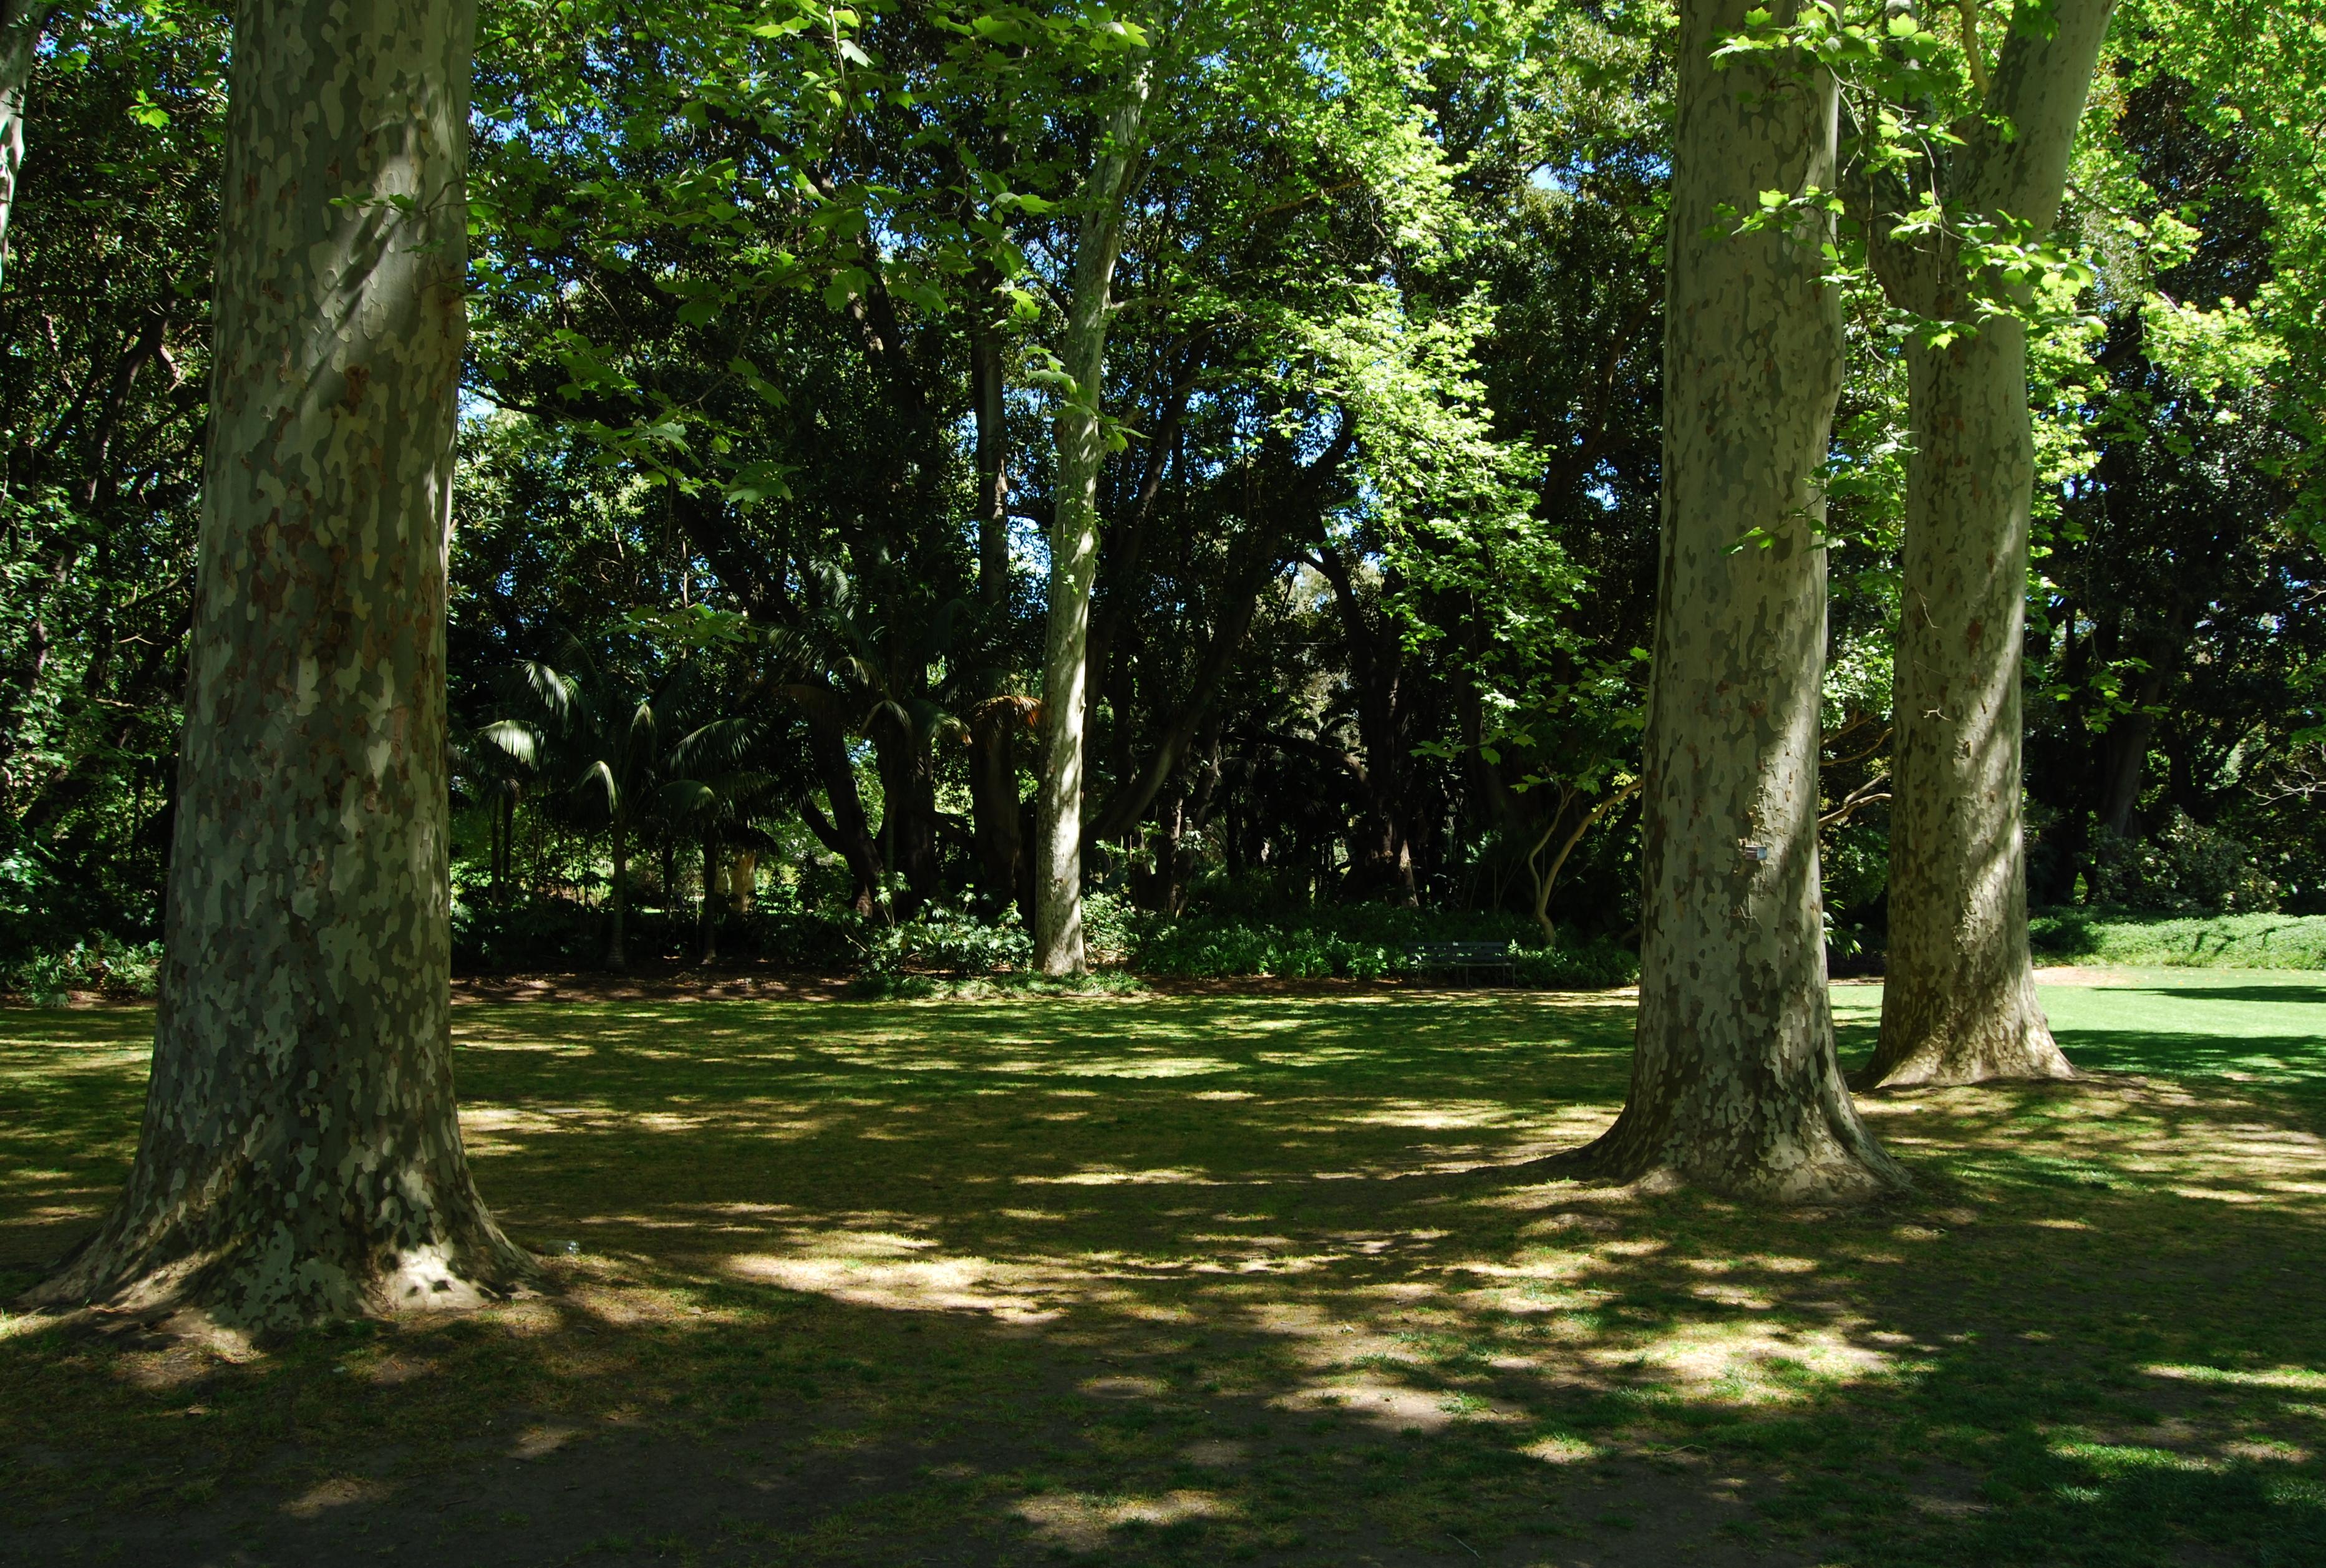 File:Dappled Shade Adelaide Botanic Garden.JPG - Wikimedia Commons